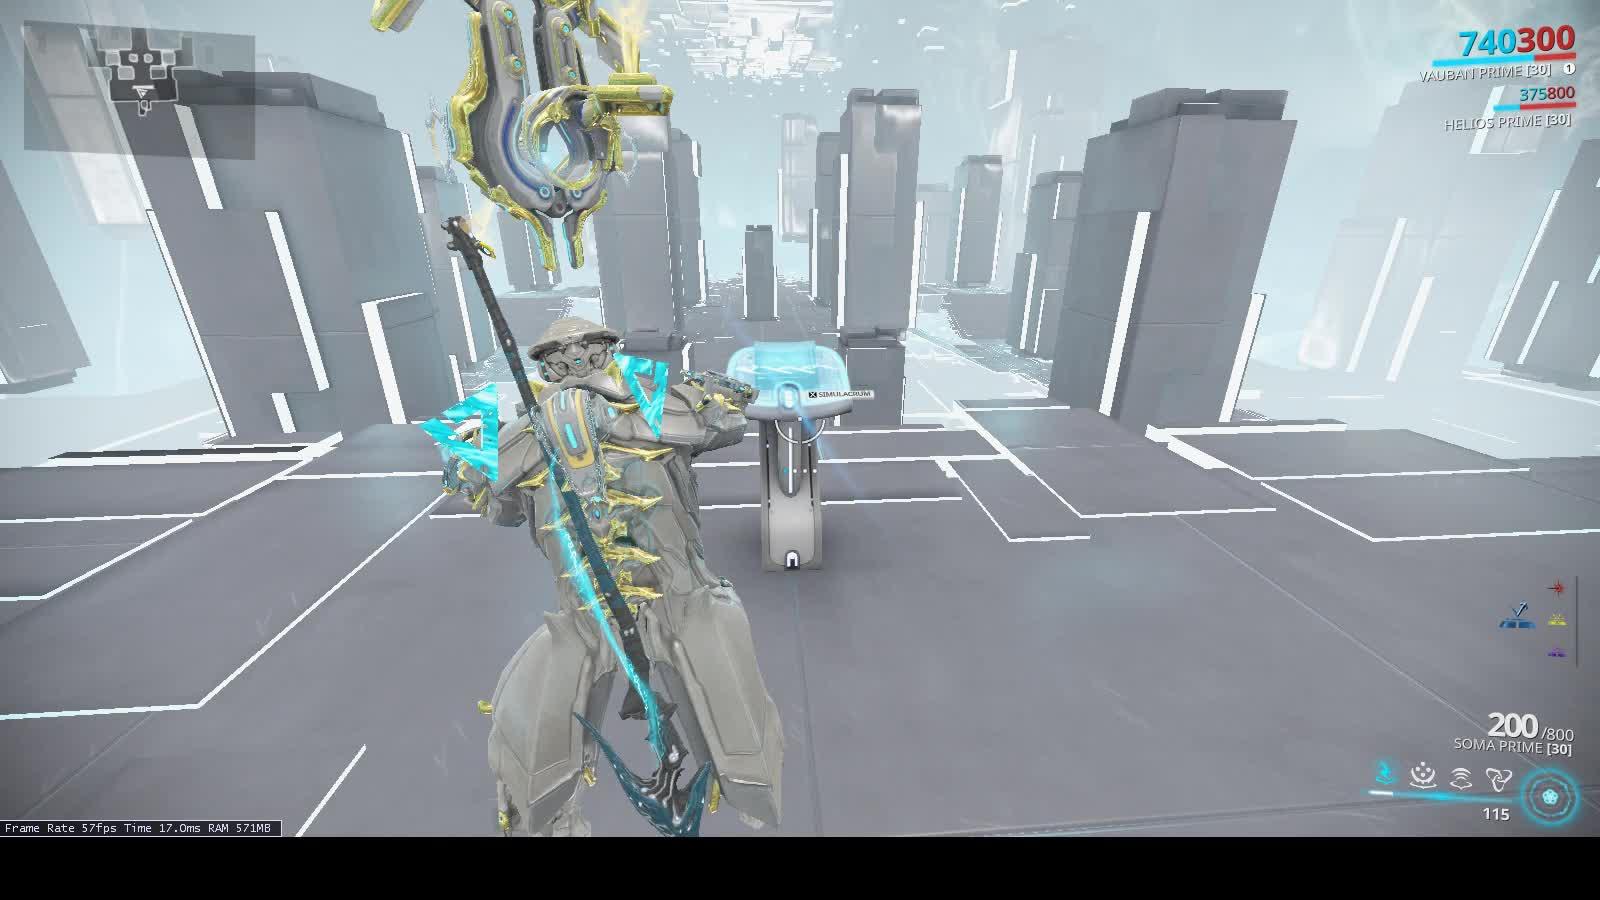 ▷ Sobek Riven Build GIF by winggun - Find & Download